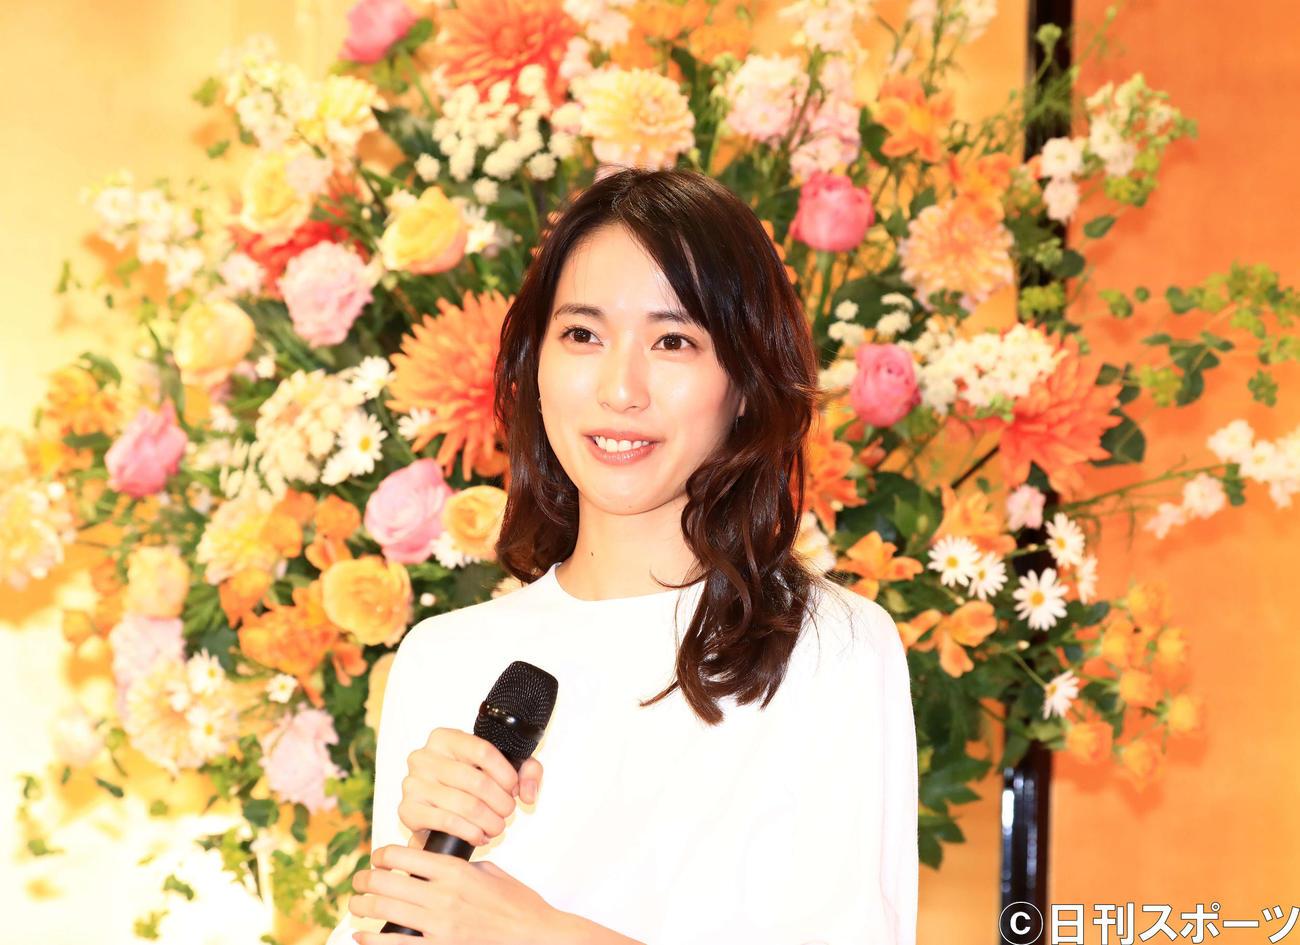 NHK連続テレビ小説「スカーレット」のヒロイン役が決まり会見を行う戸田恵梨香(2018年12月3日撮影)